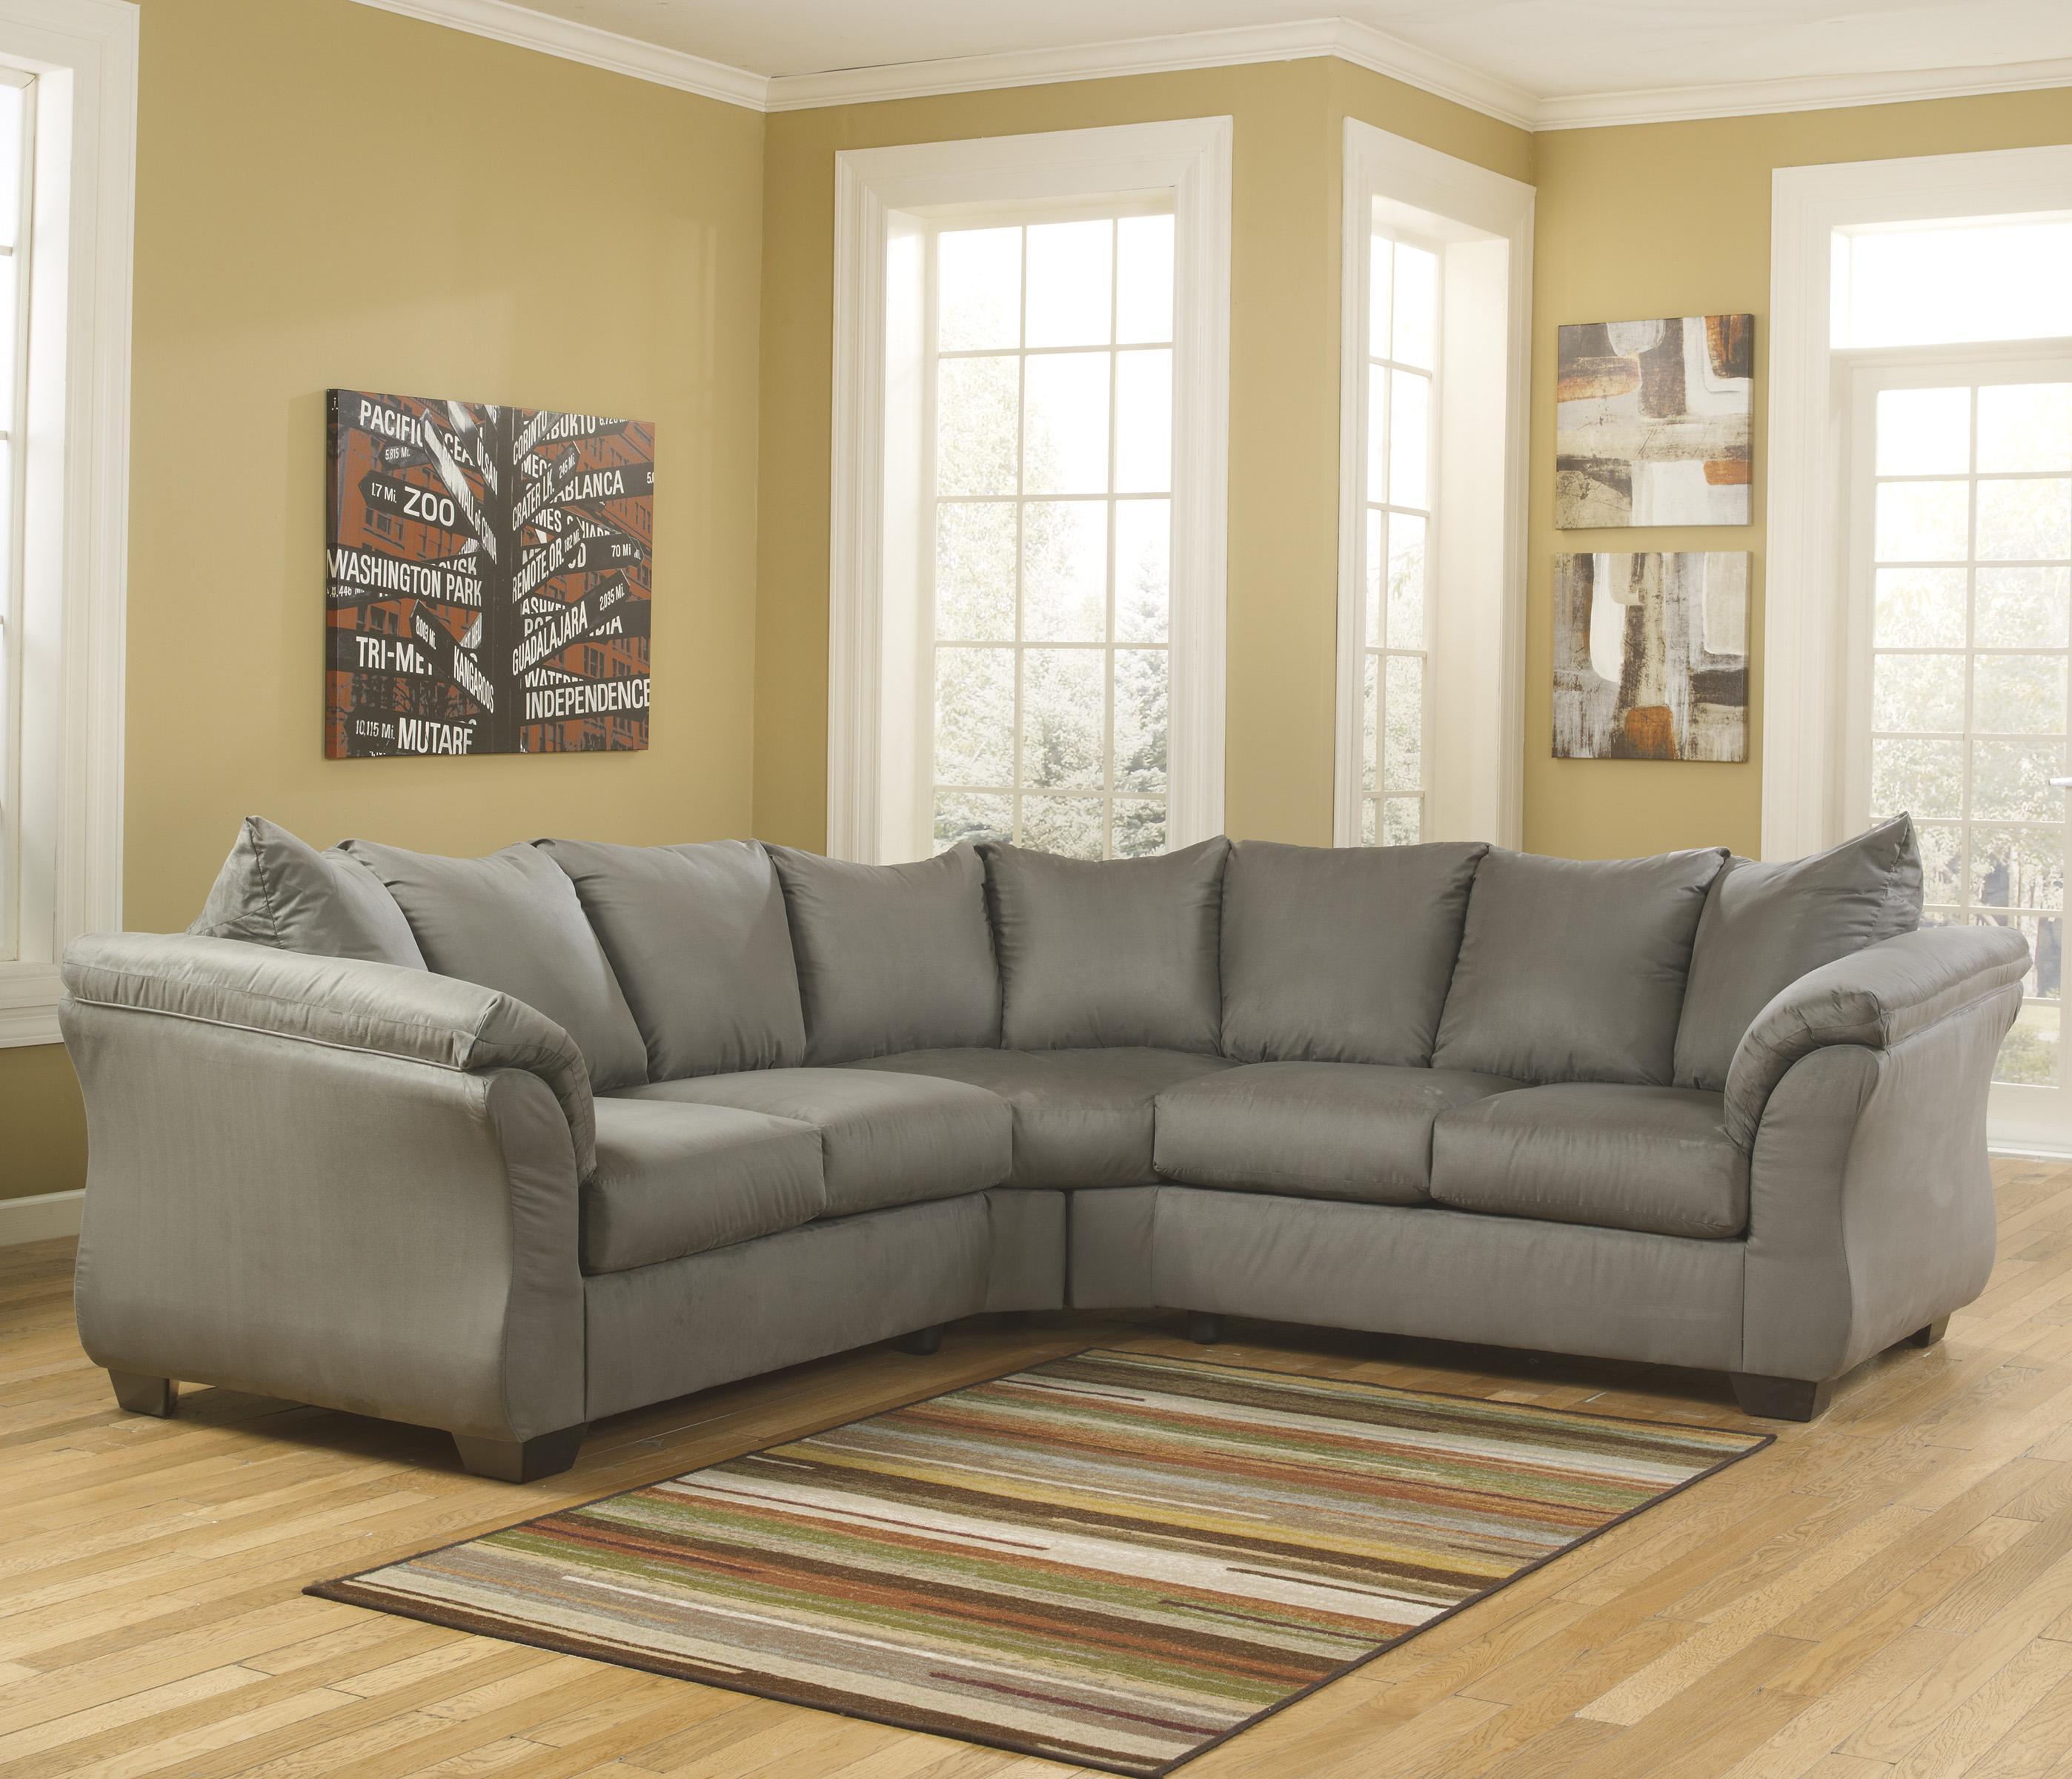 sofa ashley barcelona 2 cuerpos grey leather and loveseat signature design darcy cobblestone contemporary